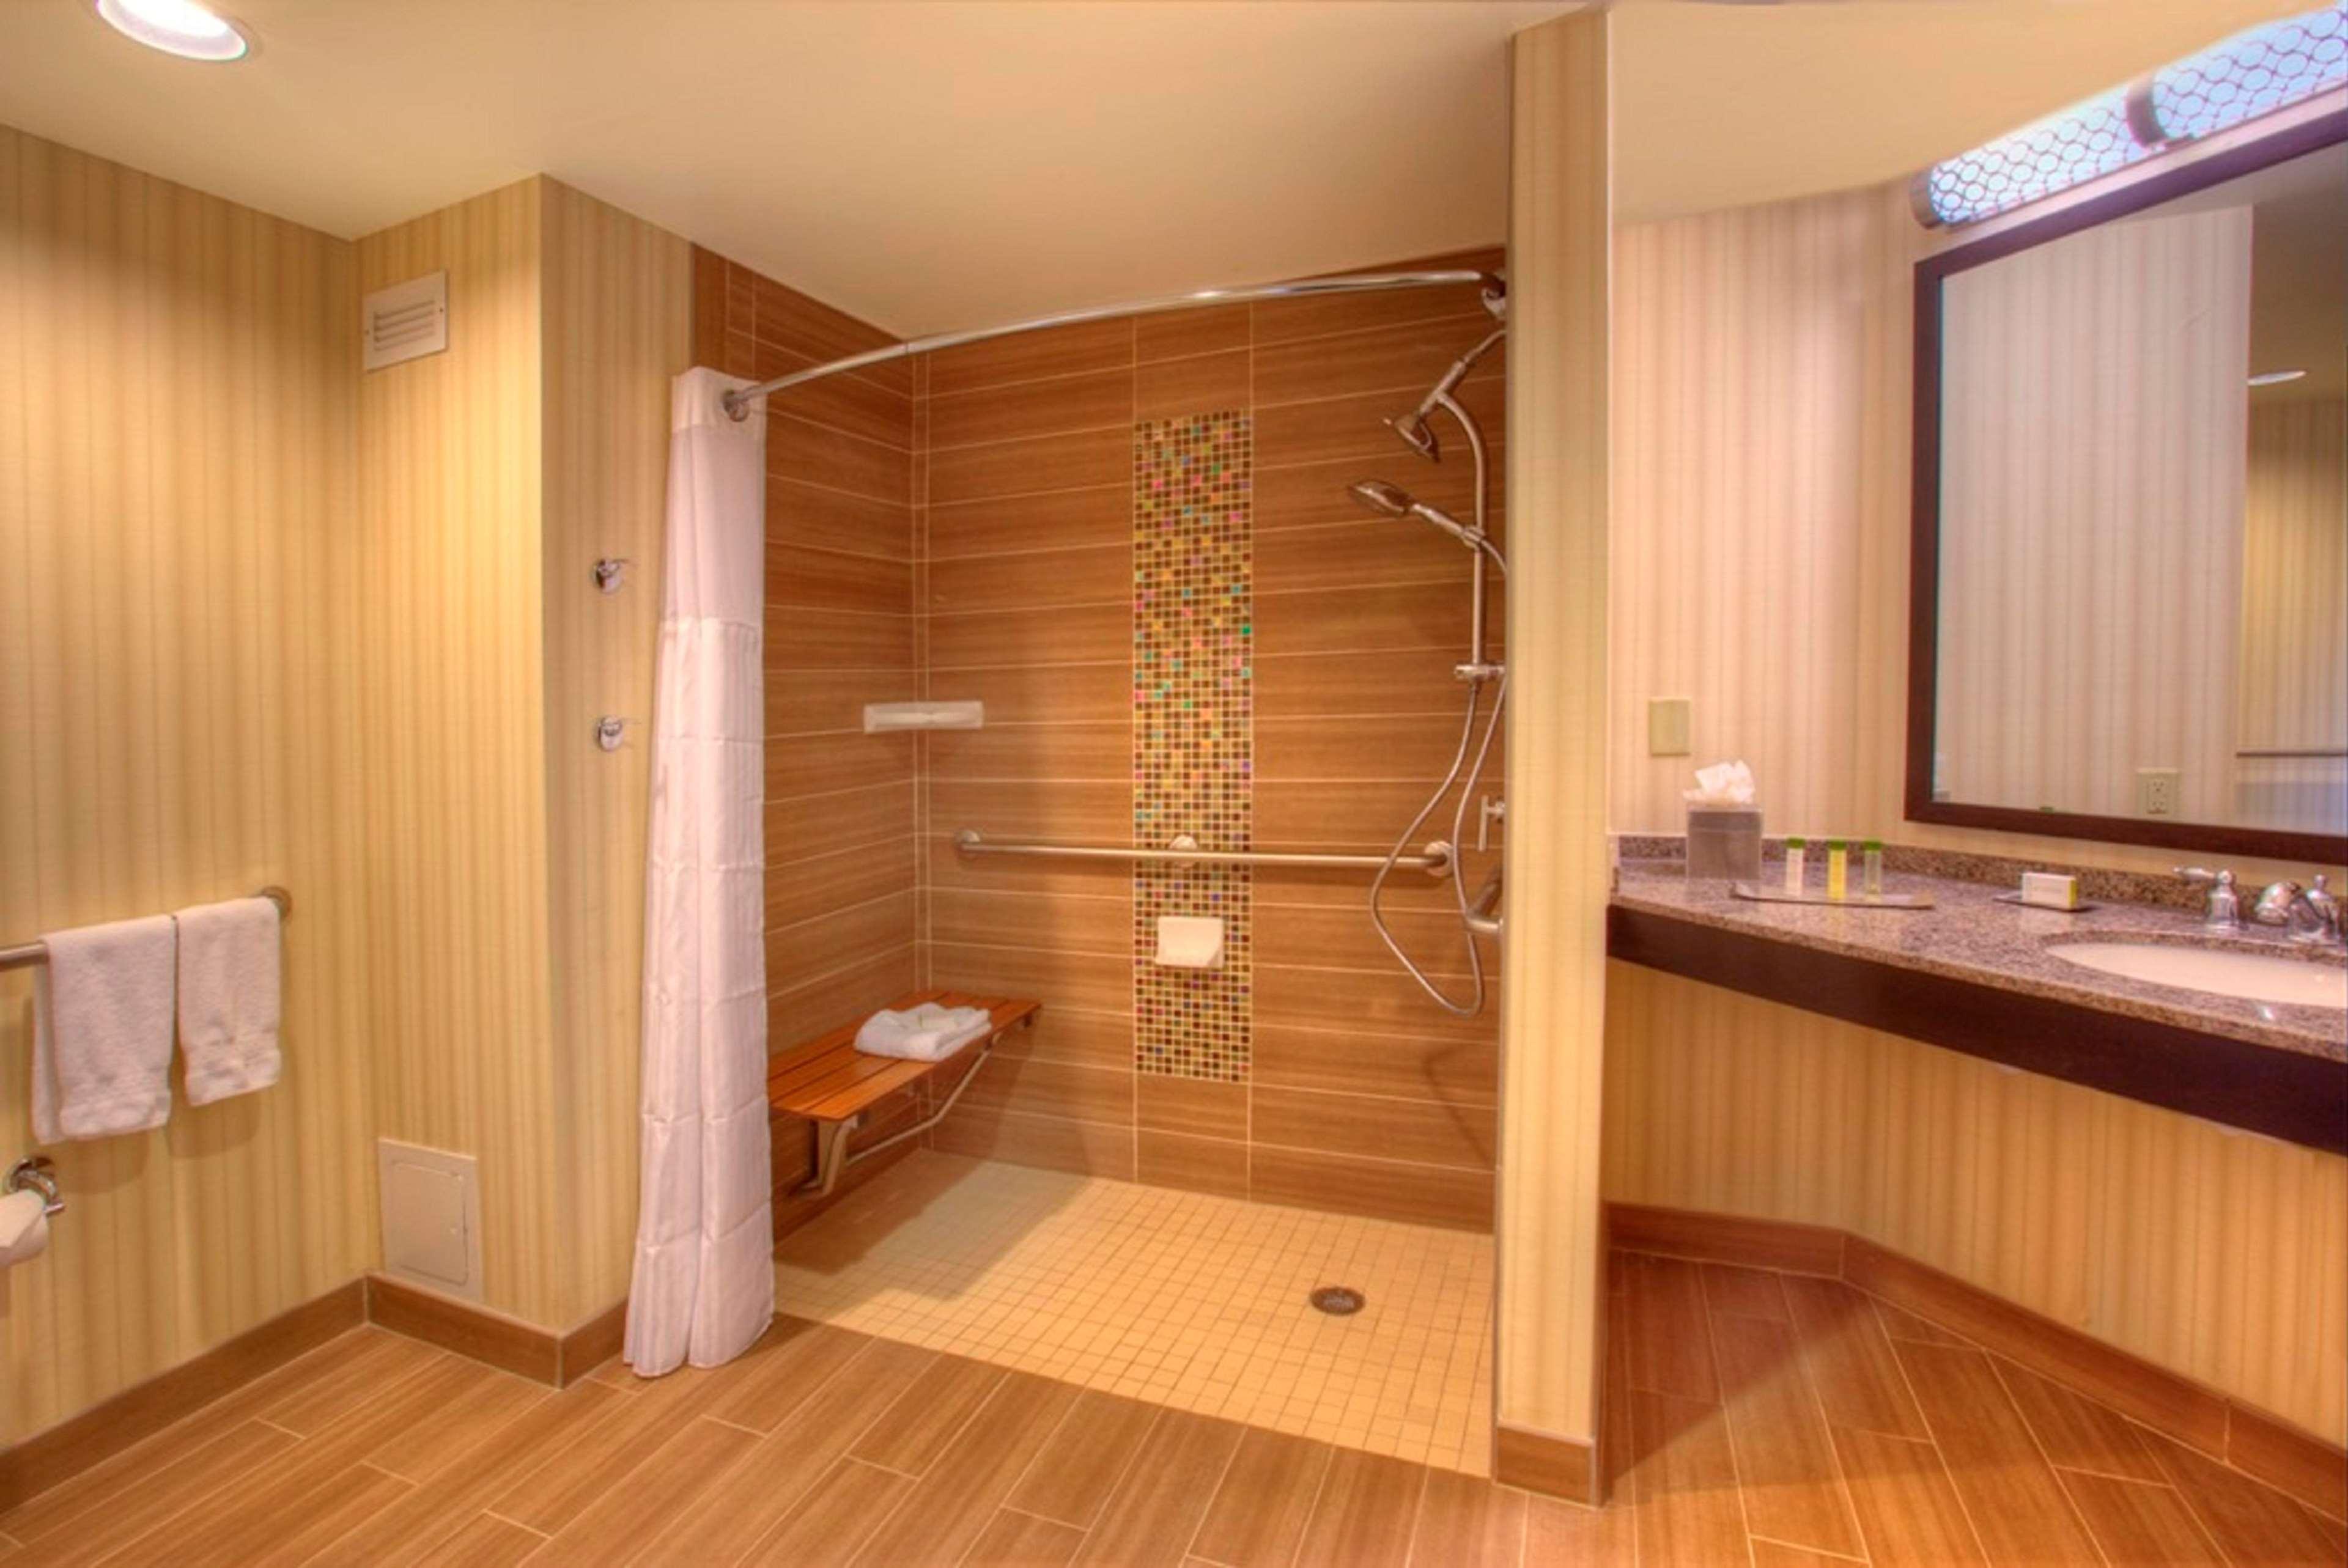 DoubleTree Suites by Hilton Orlando - Disney Springs Area image 8